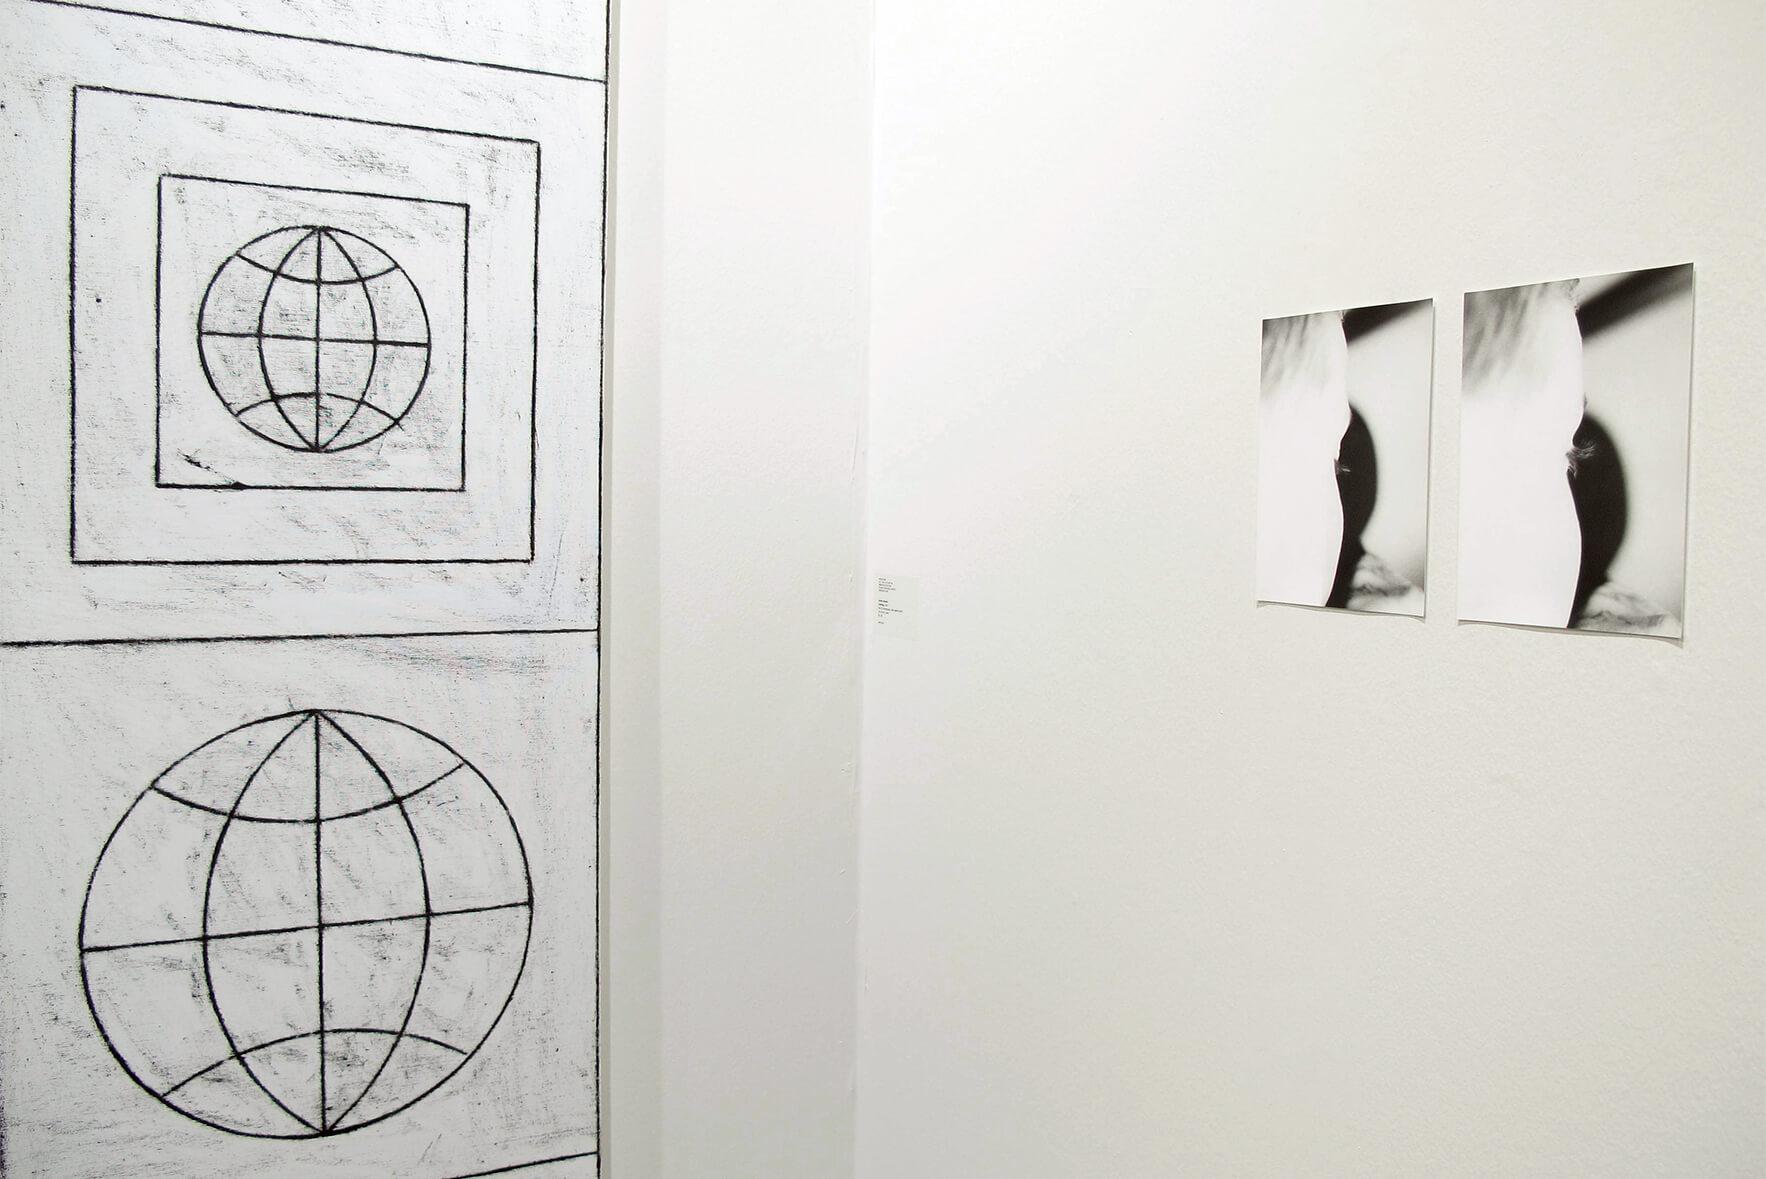 Installation view: ProjecteSD, Booth L4   ART BASEL 2016   ProjecteSD